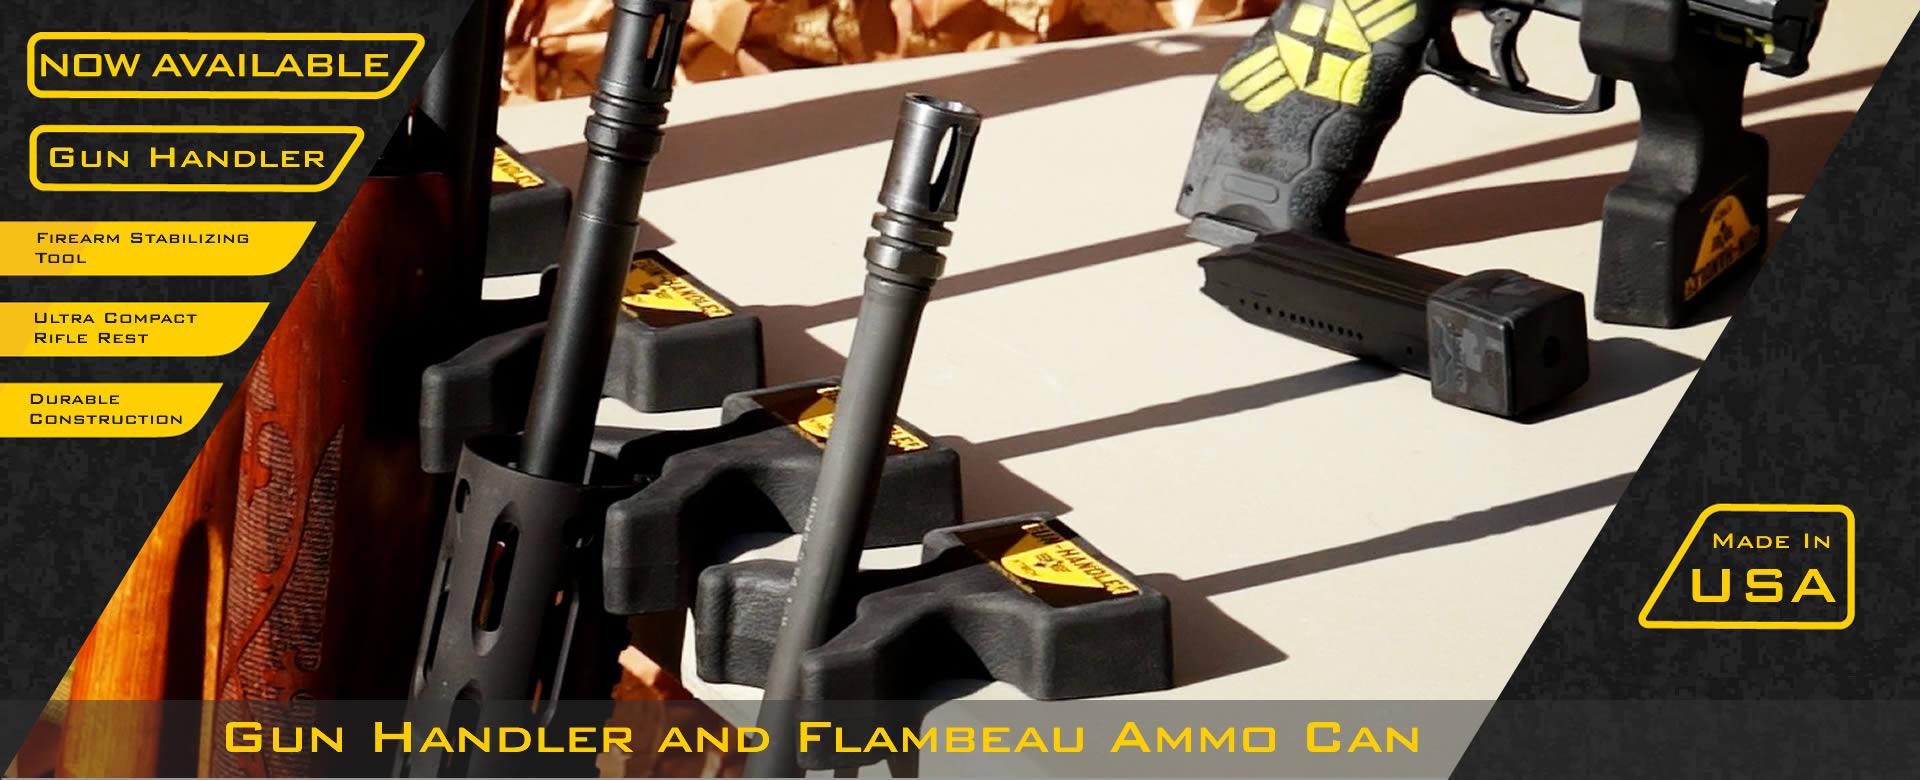 gun-handler-solo-1